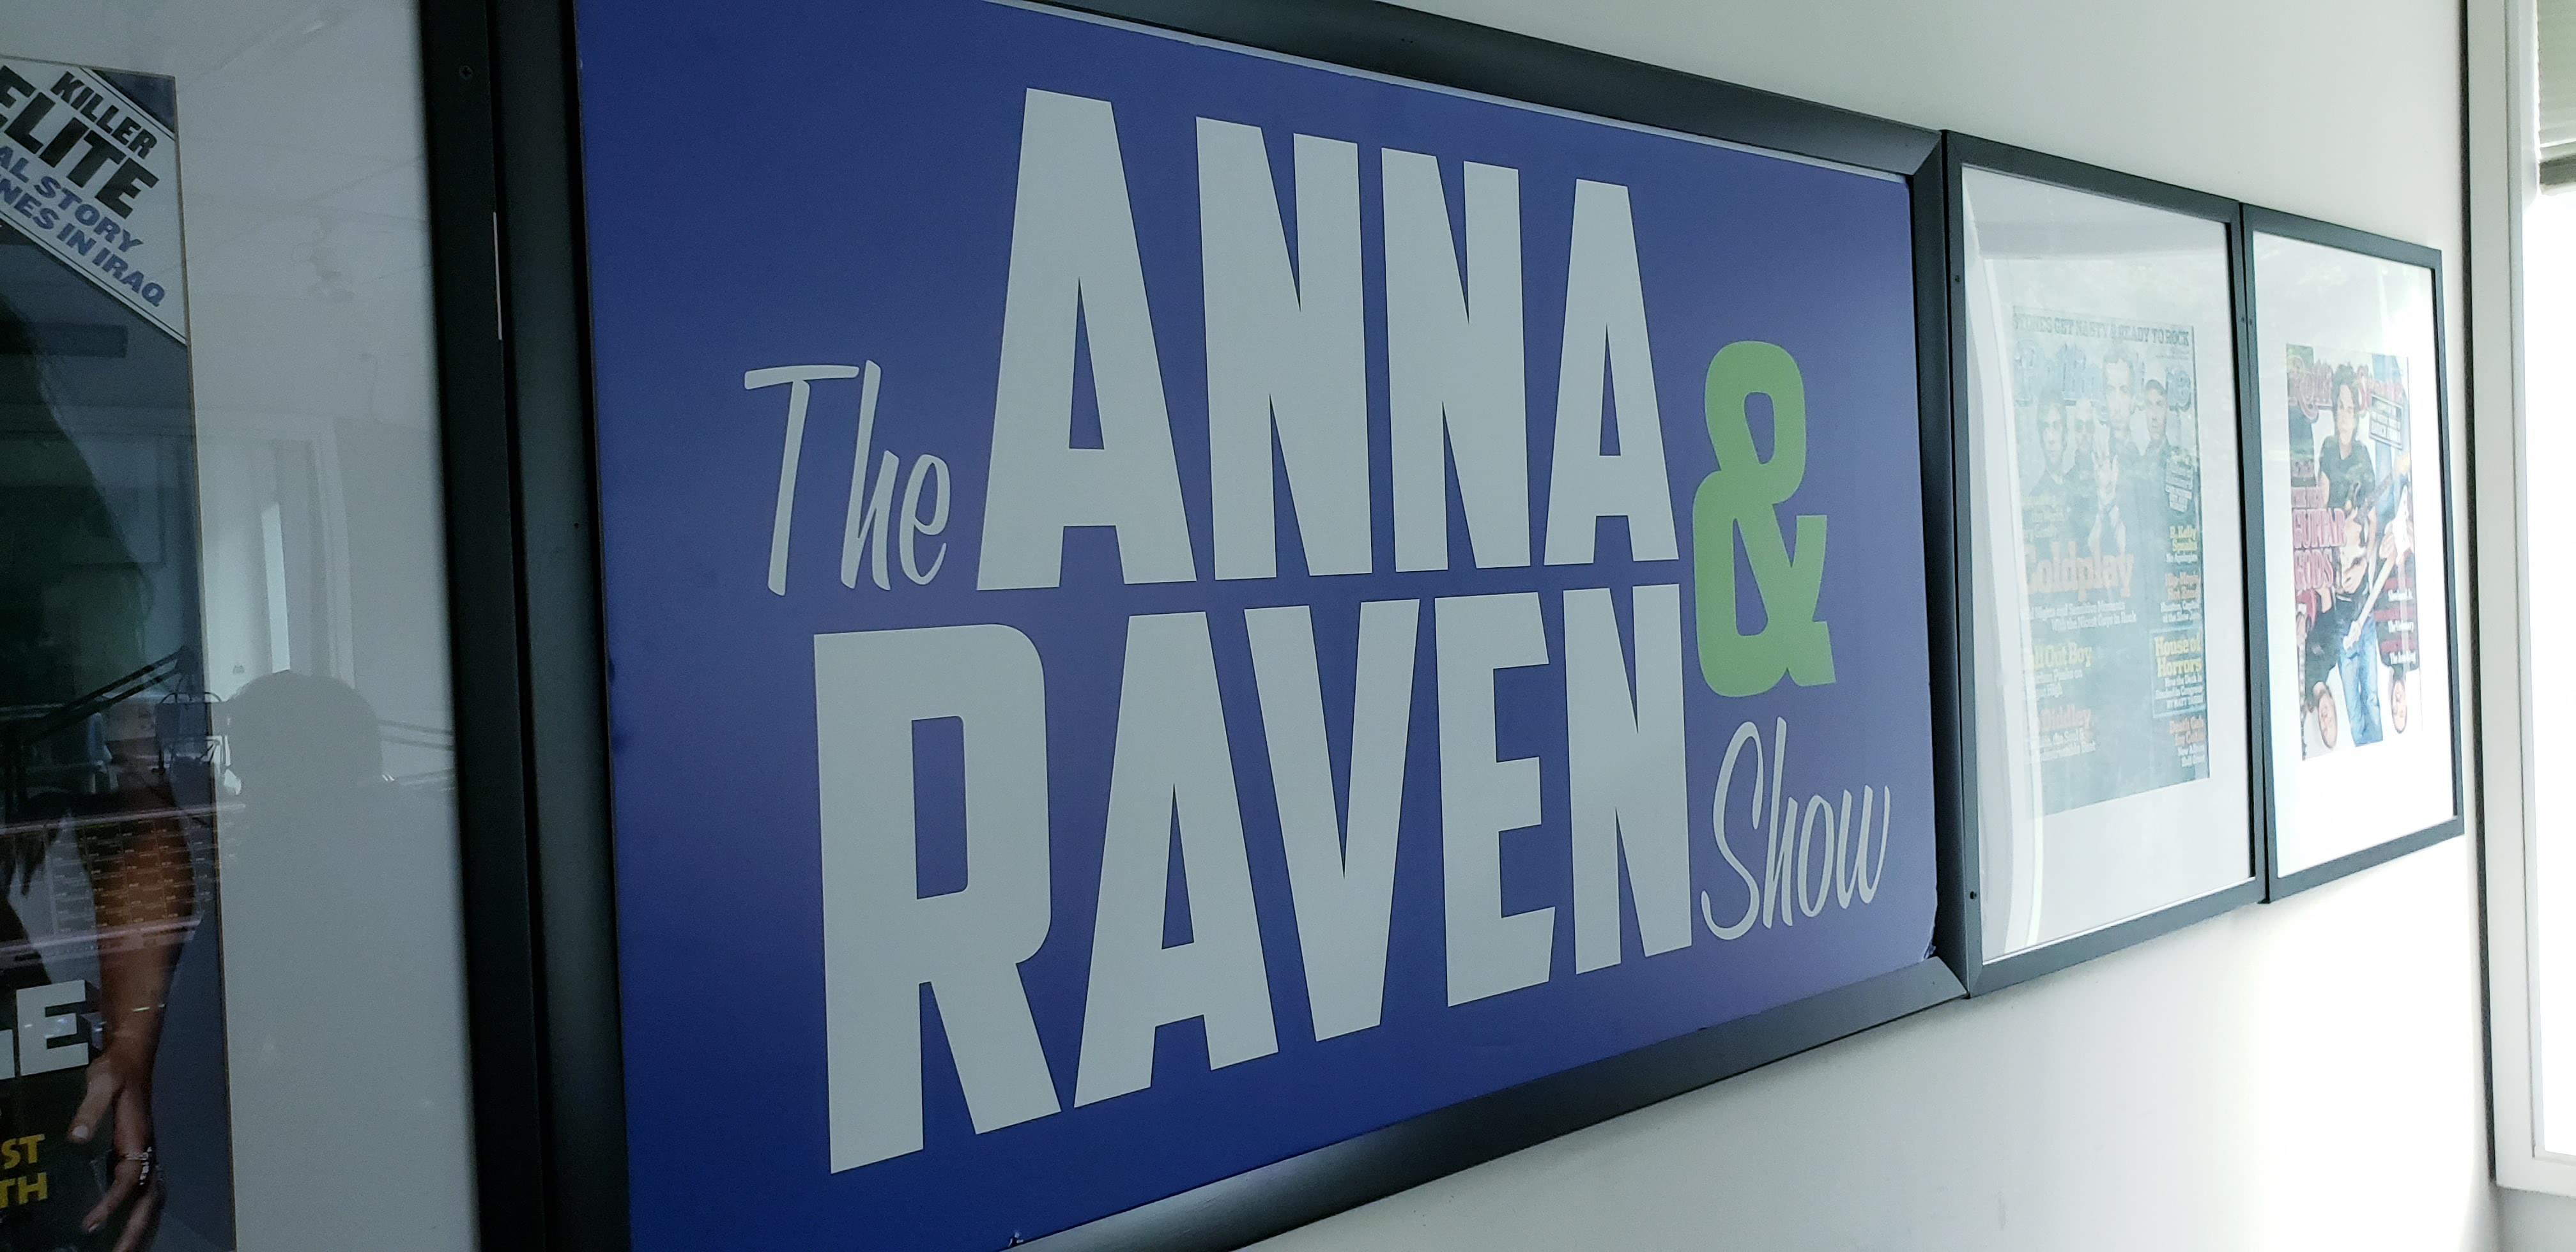 Anna & Raven Have Some Big News!